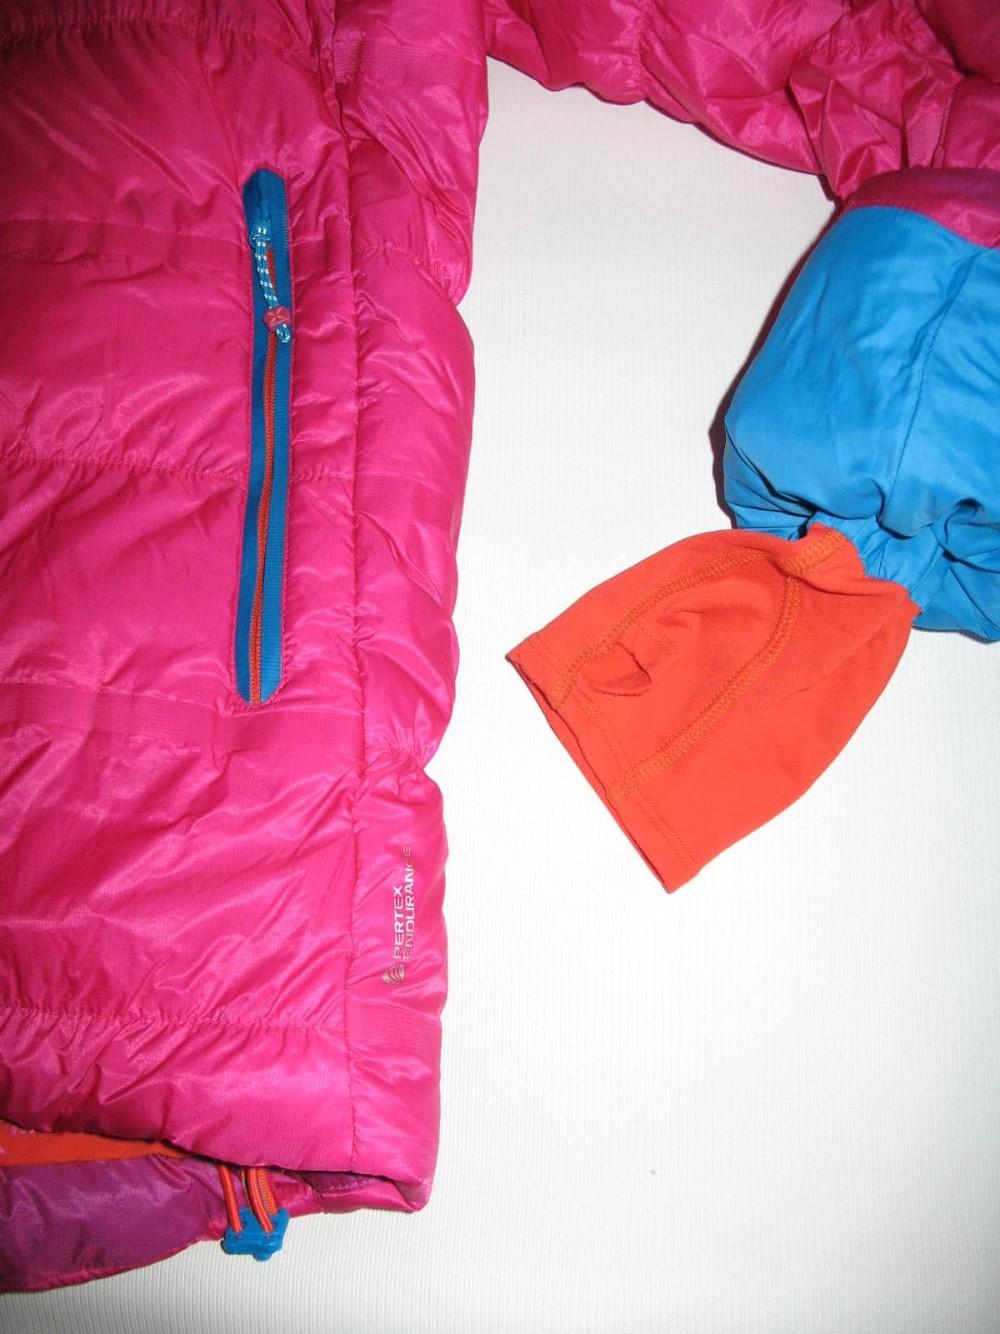 Куртка MAMMUT biwak eiger extreme jacket lady (размер S/M),3200 грн - 8